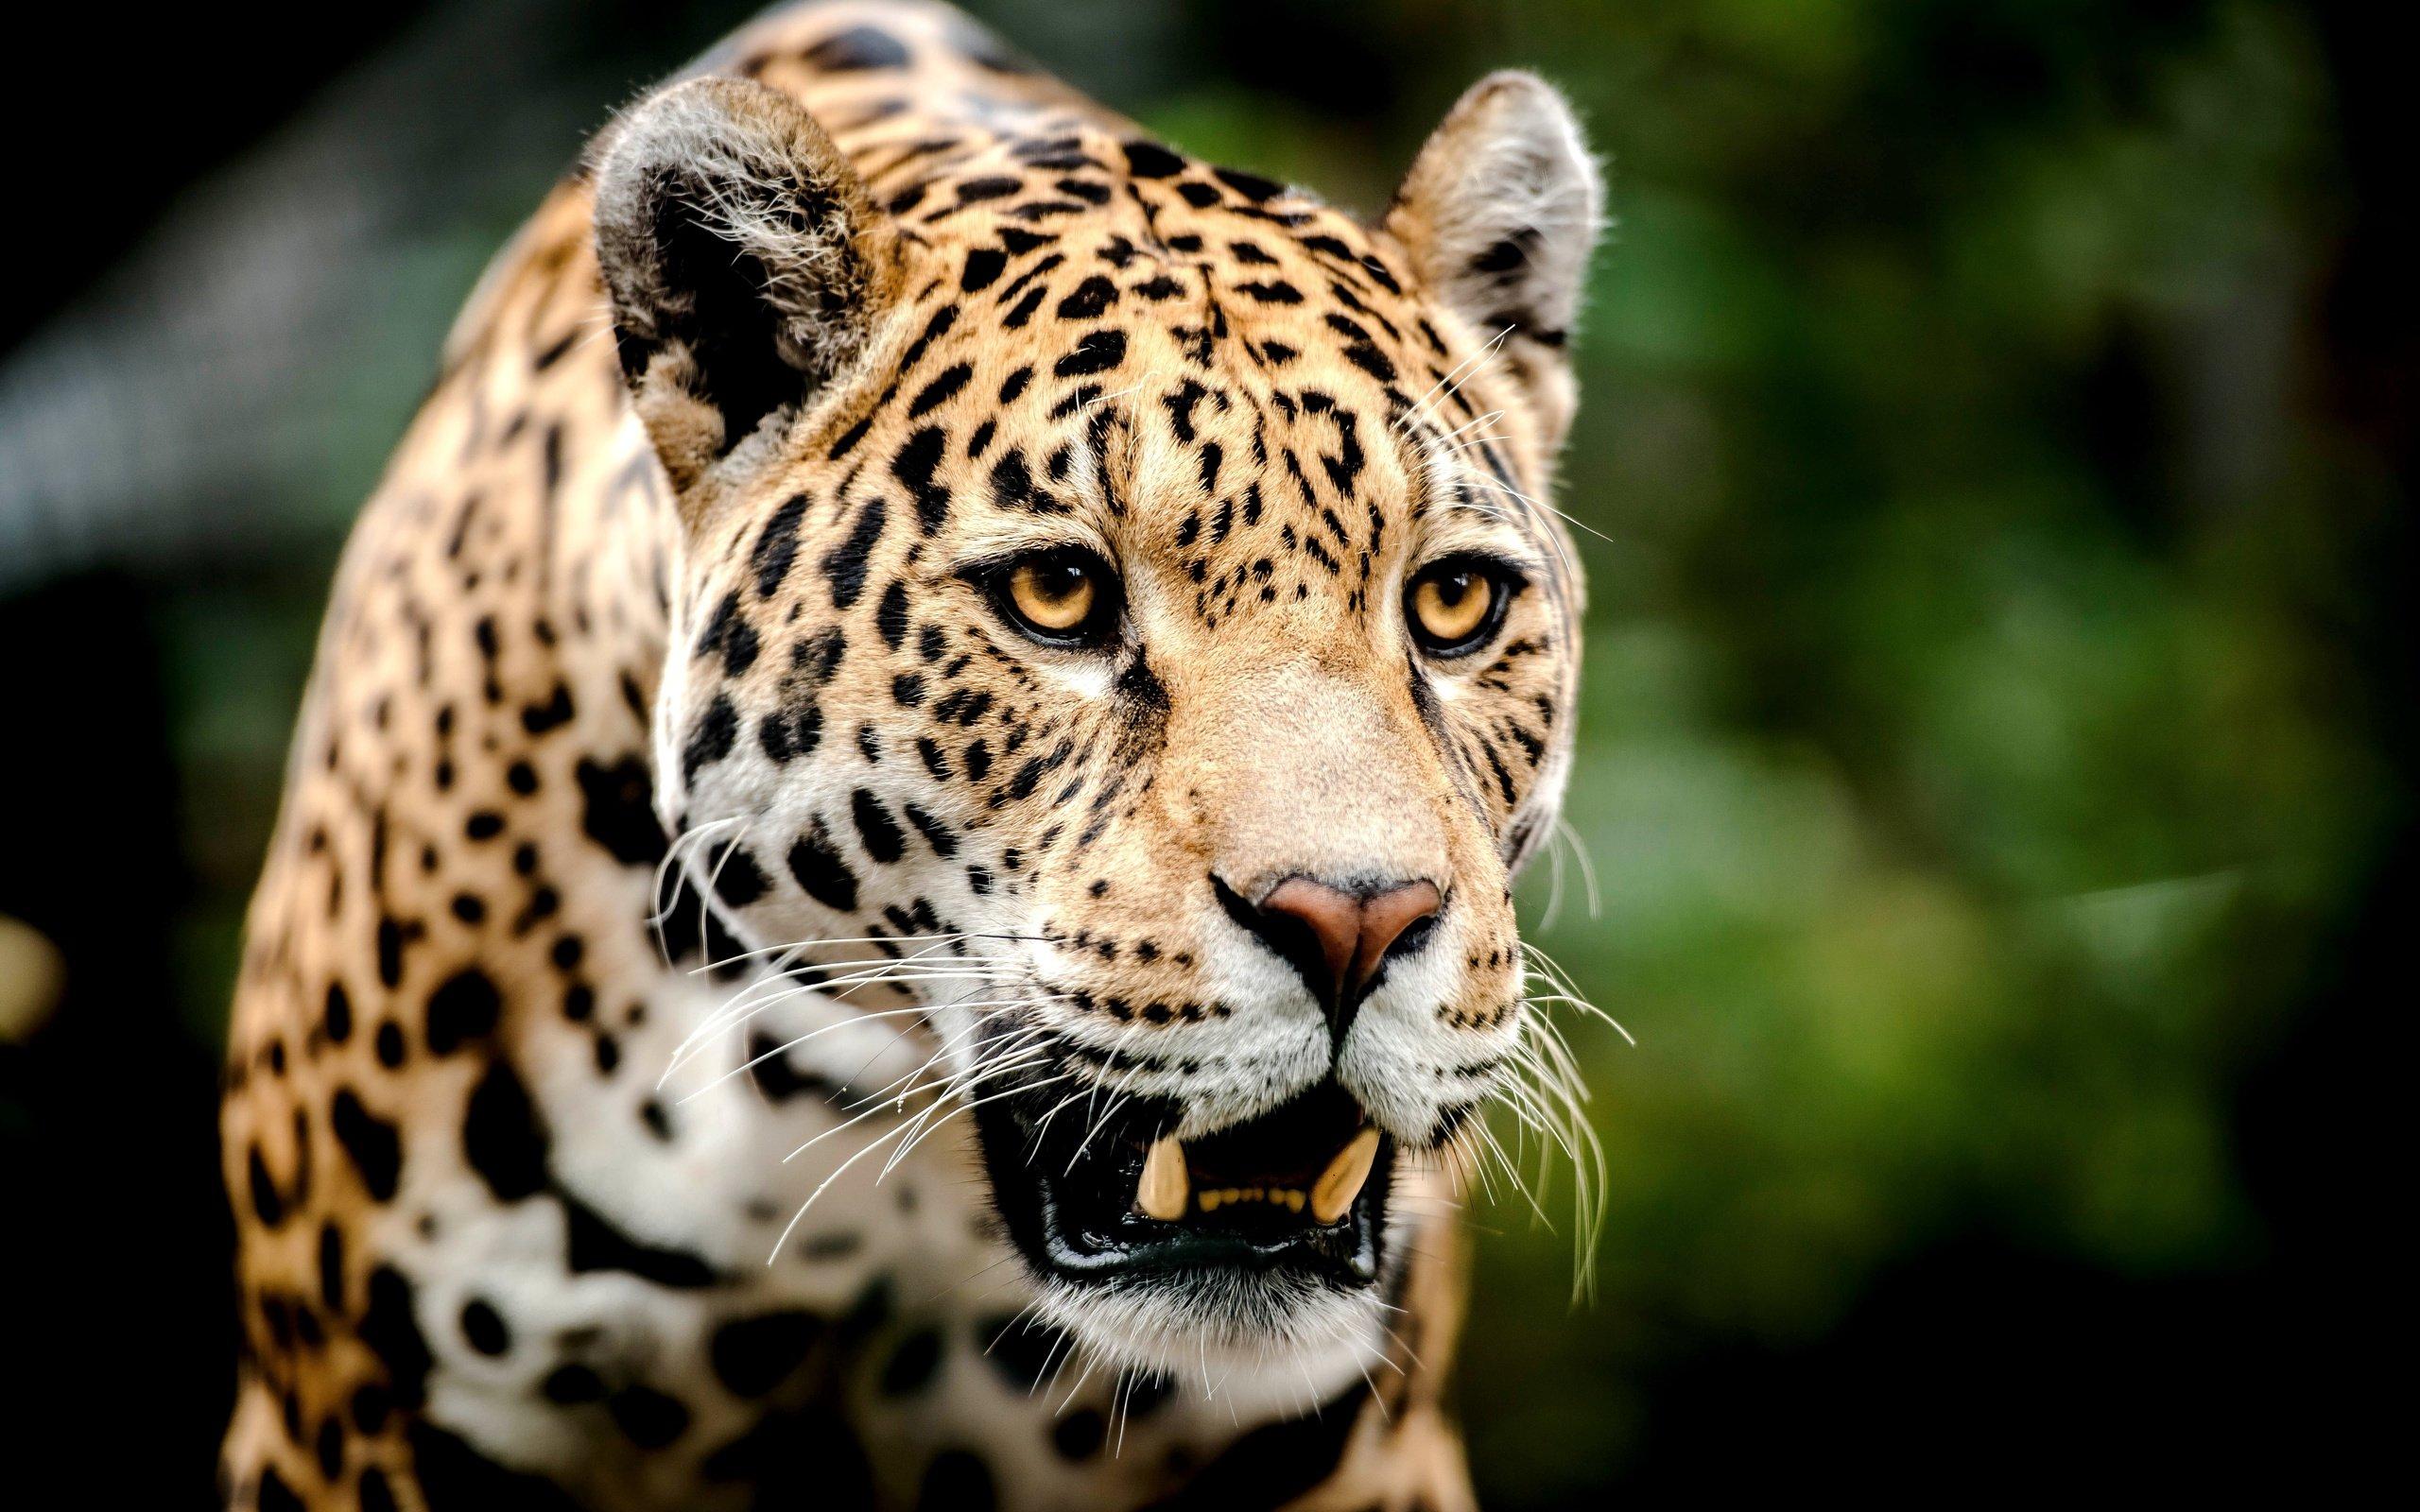 Jaguar Predator Black Animal Muzzle Art Wallpaper: Jaguar Muzzle Big Cat Predator Wallpaper